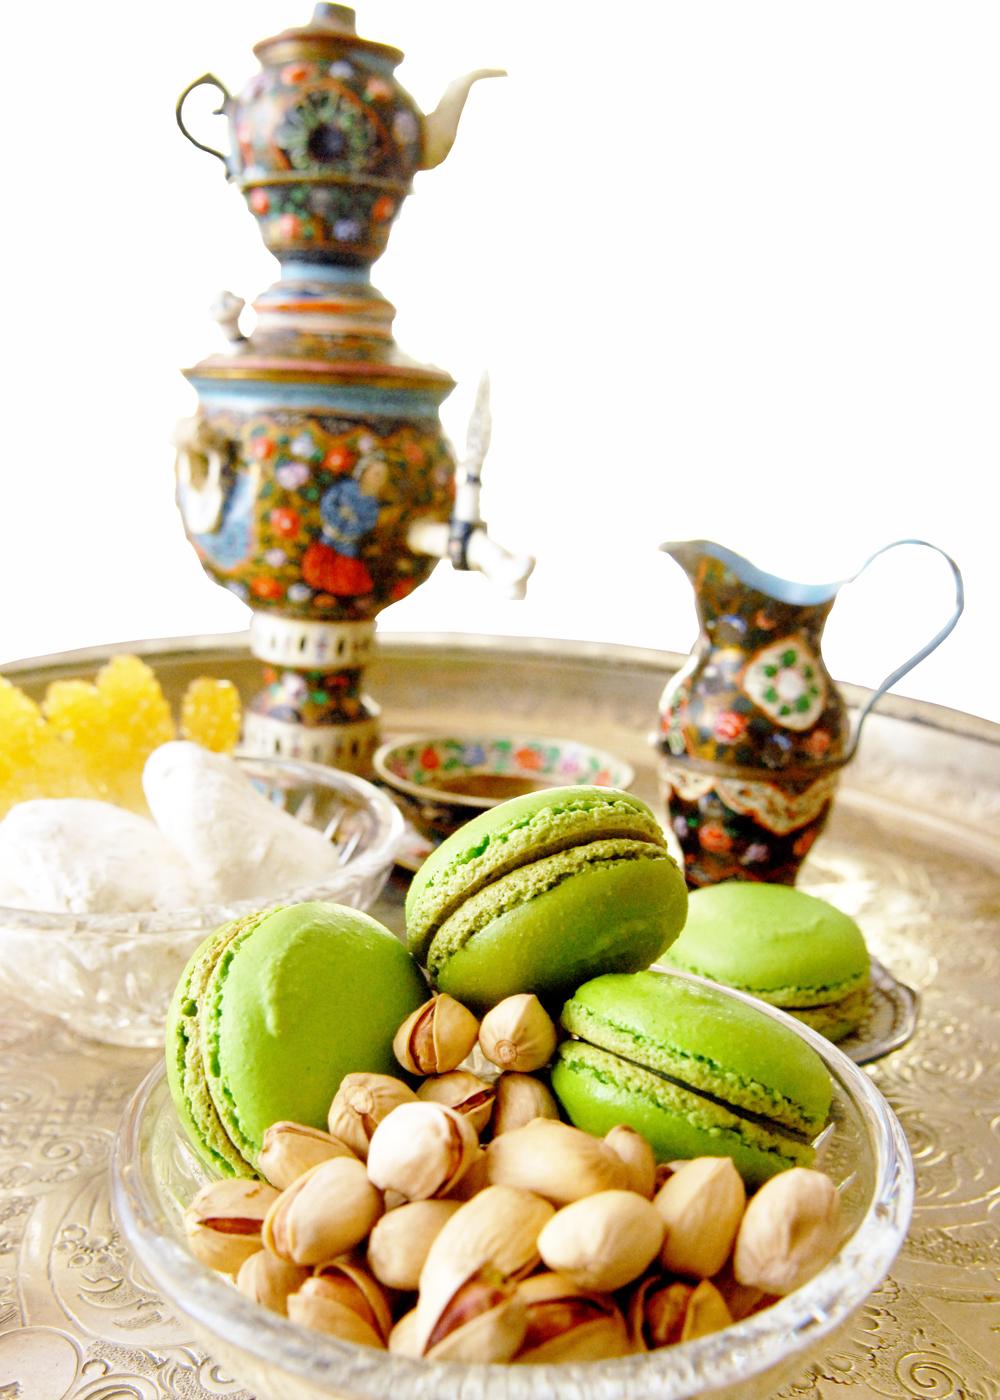 pistachio3.jpg